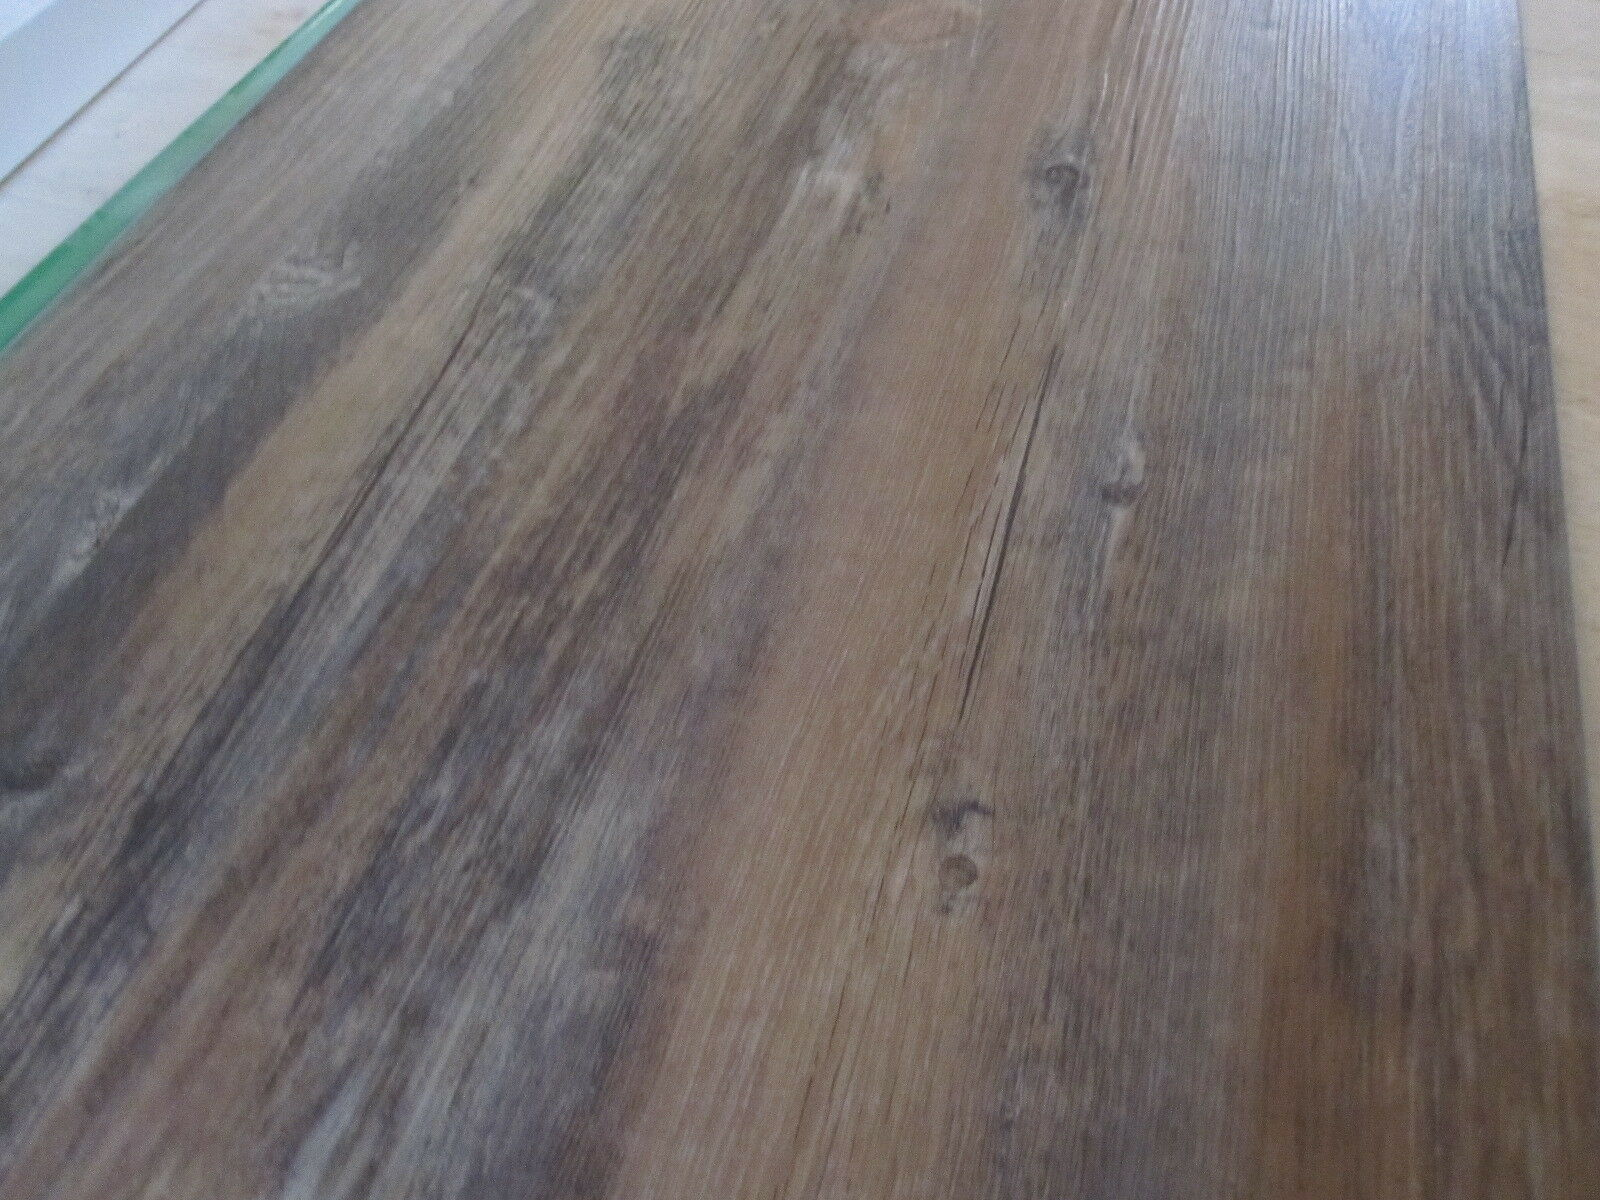 24 m vinylboden eiche vinyl pvc holzoptik parkett laminat restposten holz klick ebay. Black Bedroom Furniture Sets. Home Design Ideas